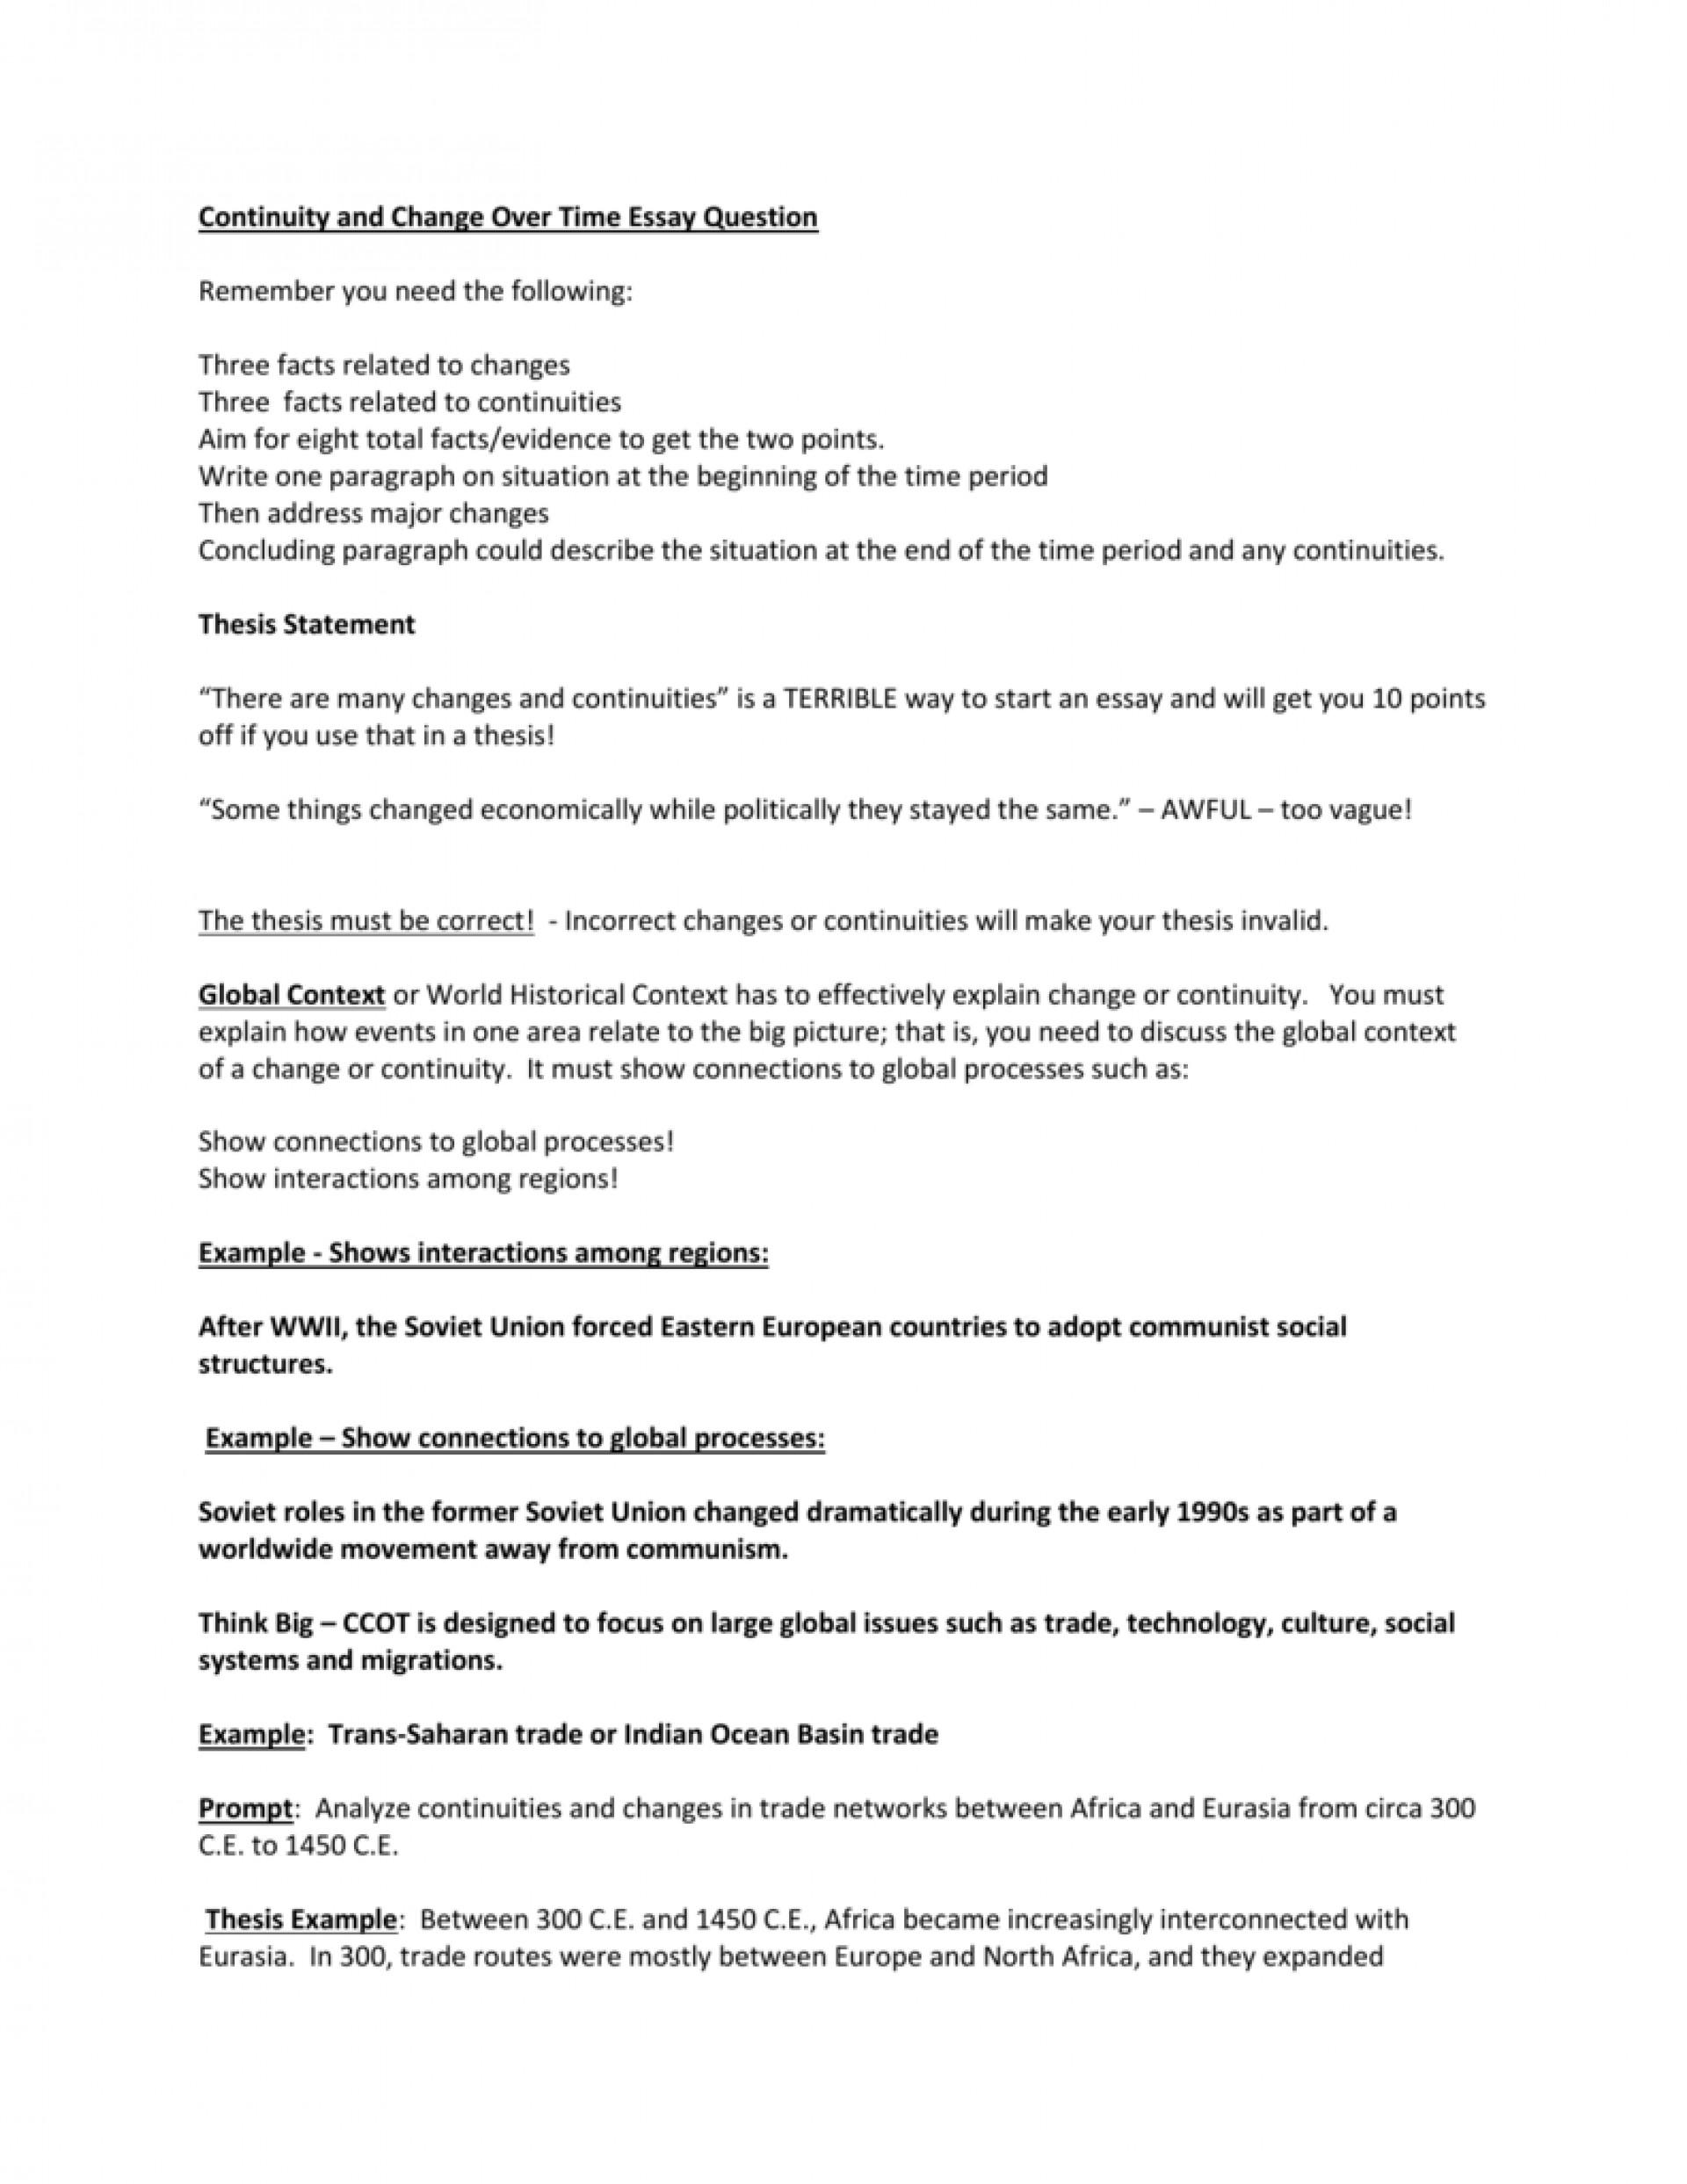 Comparison-contrast essay